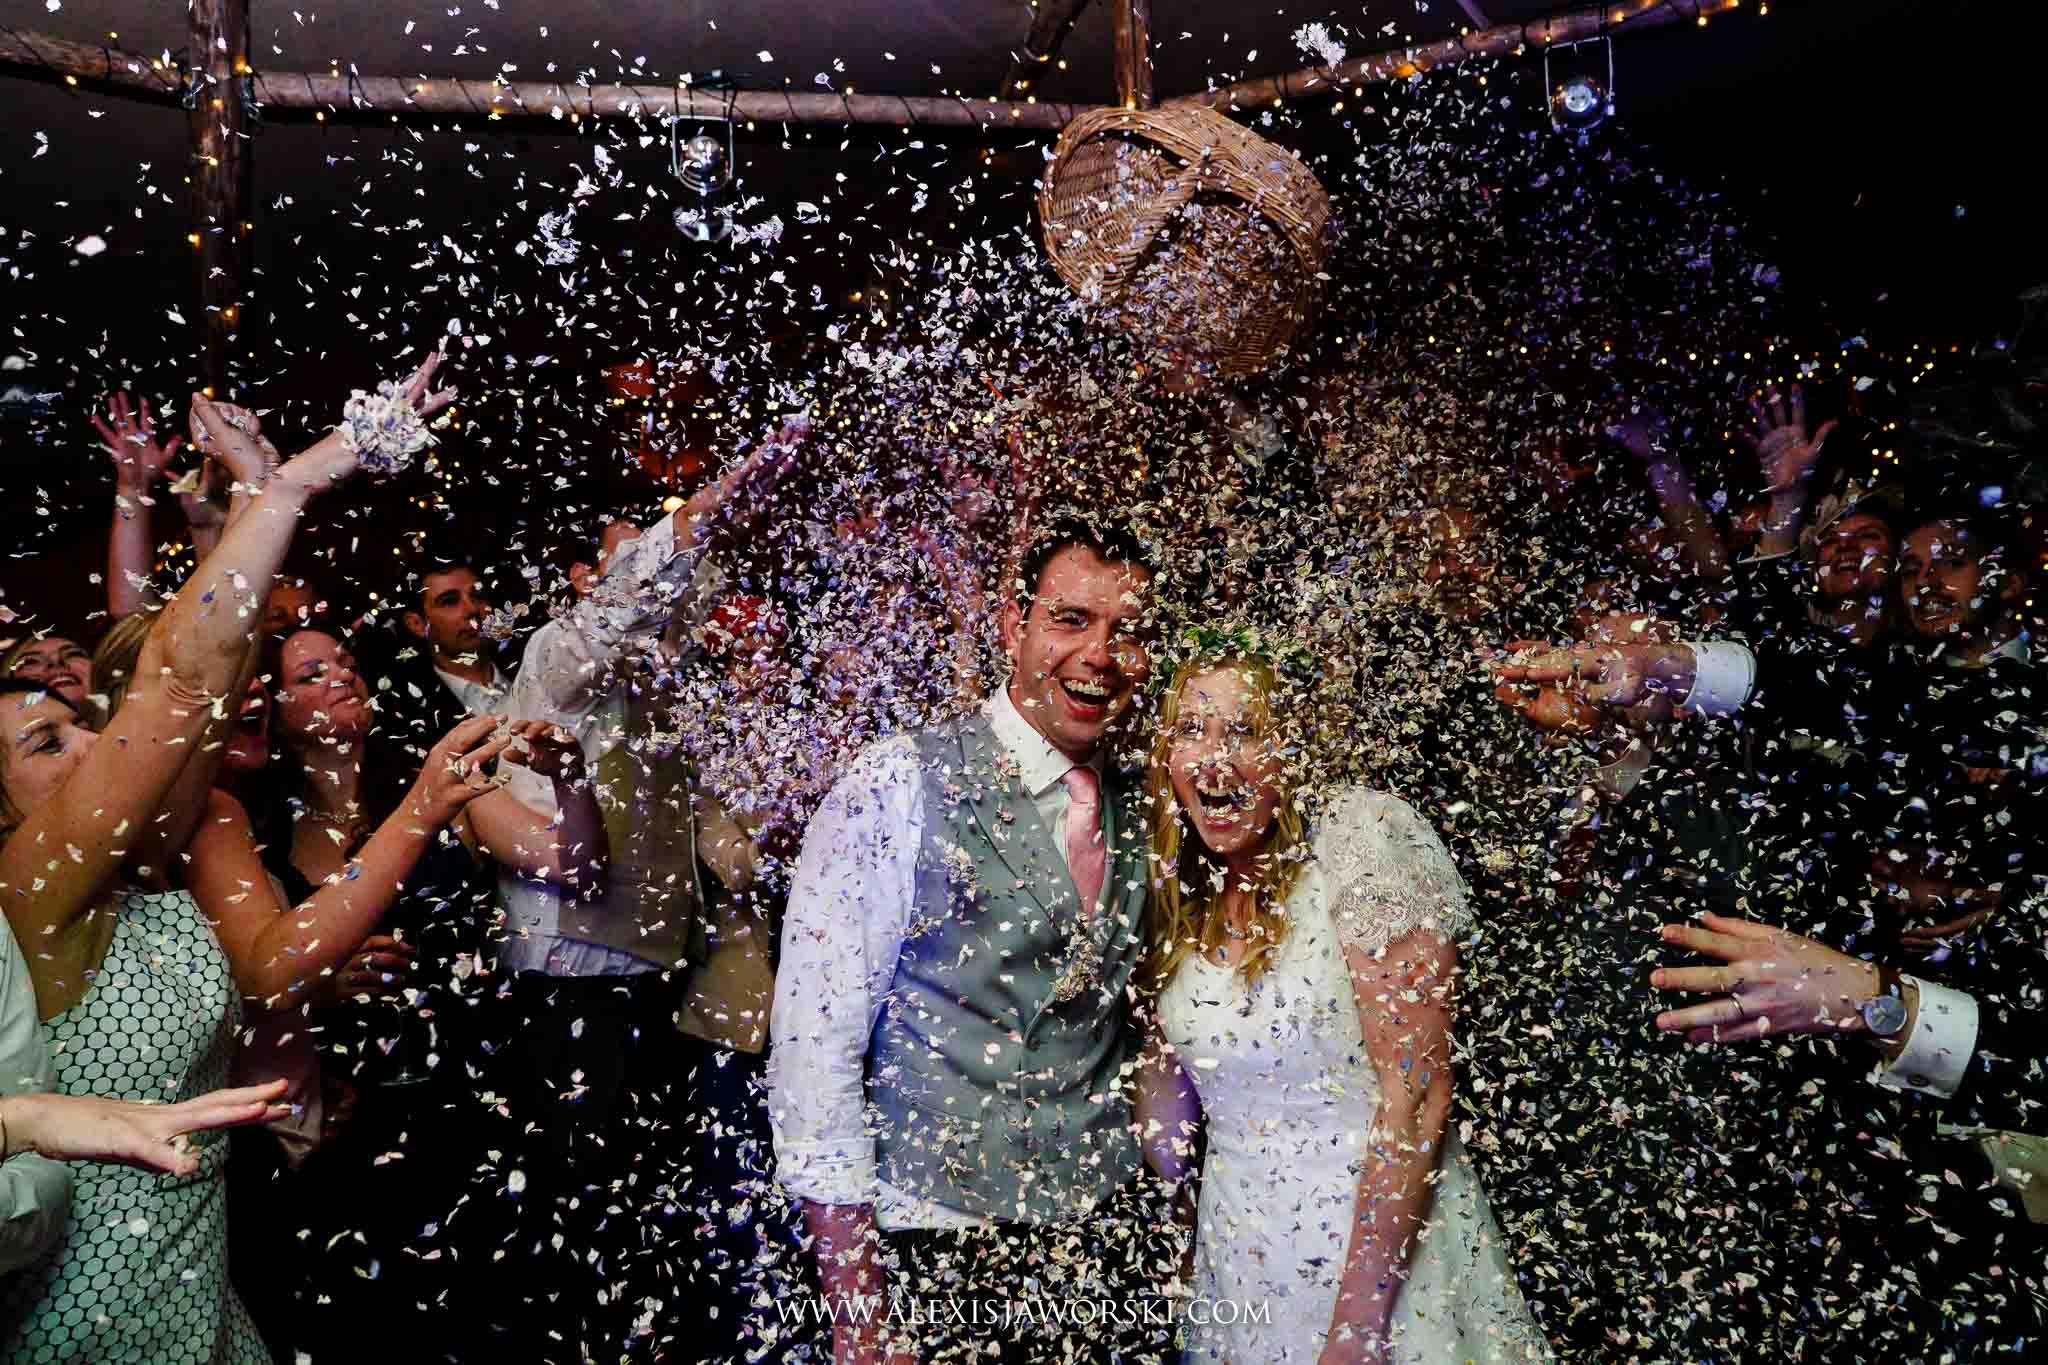 Confettis on dancefloor